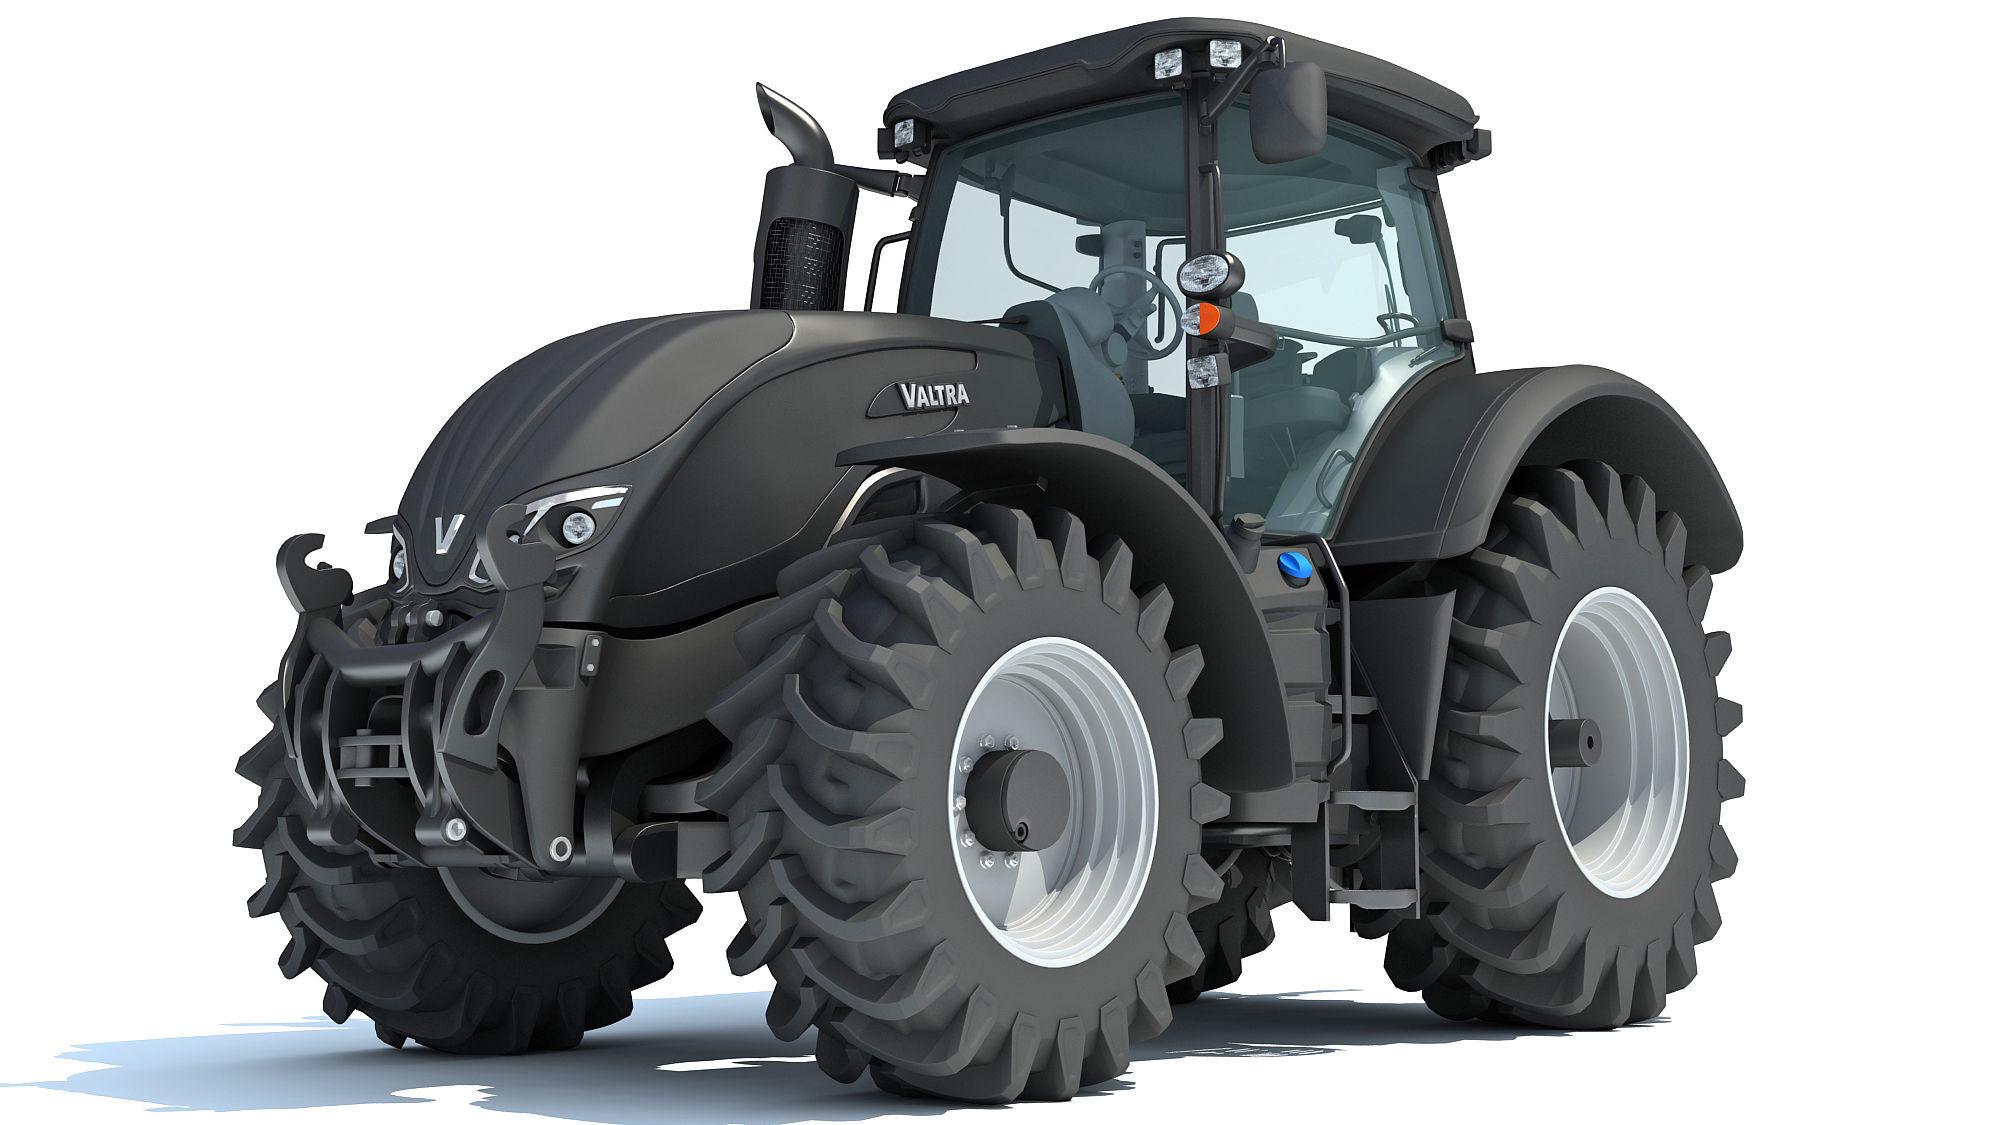 Valtra Tractor S4 Series